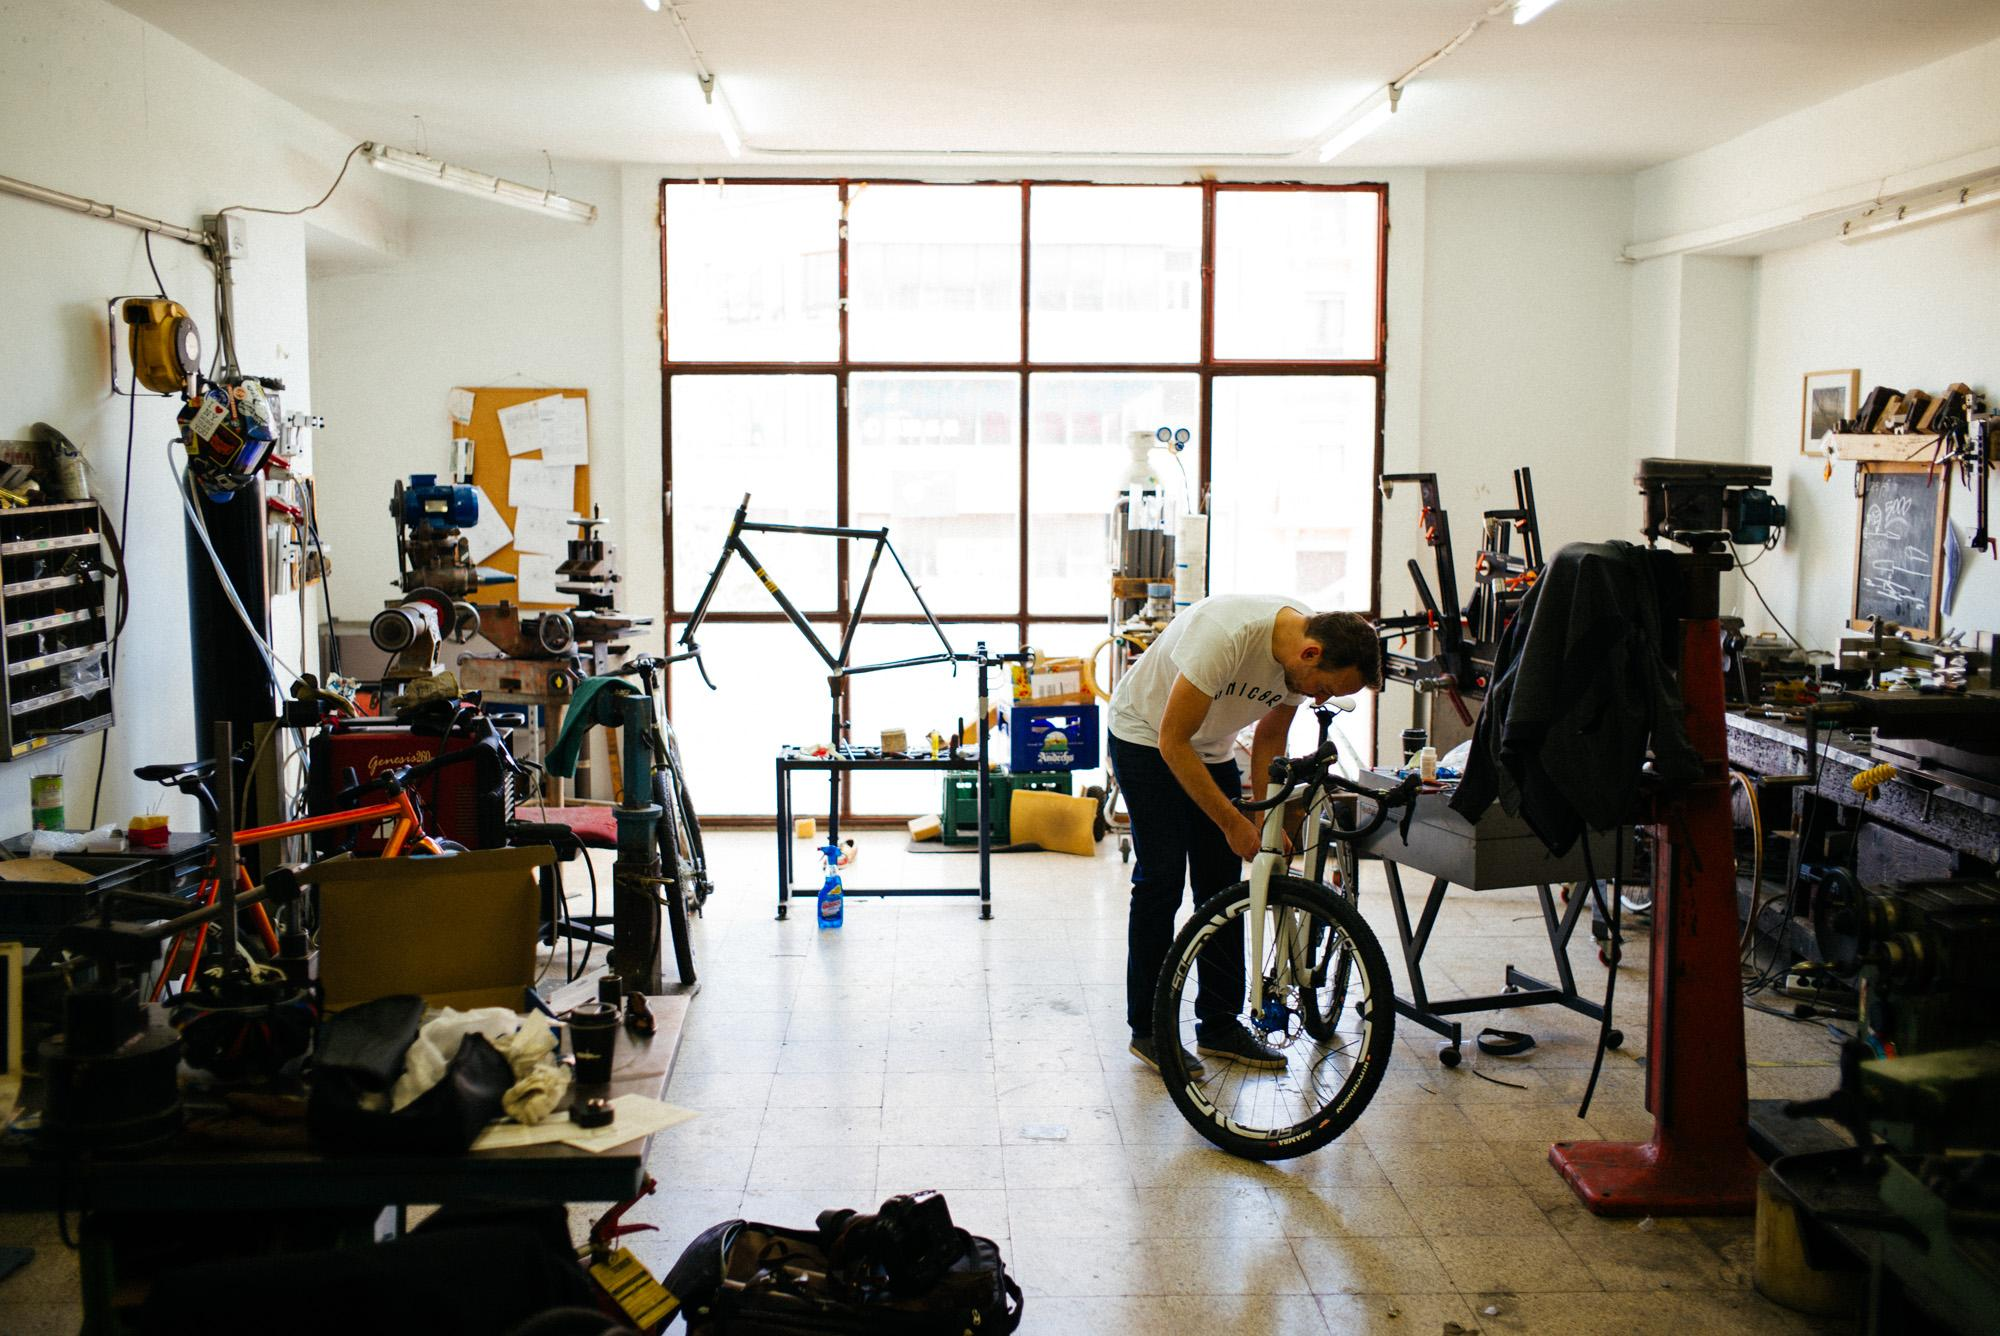 It's bike building day...